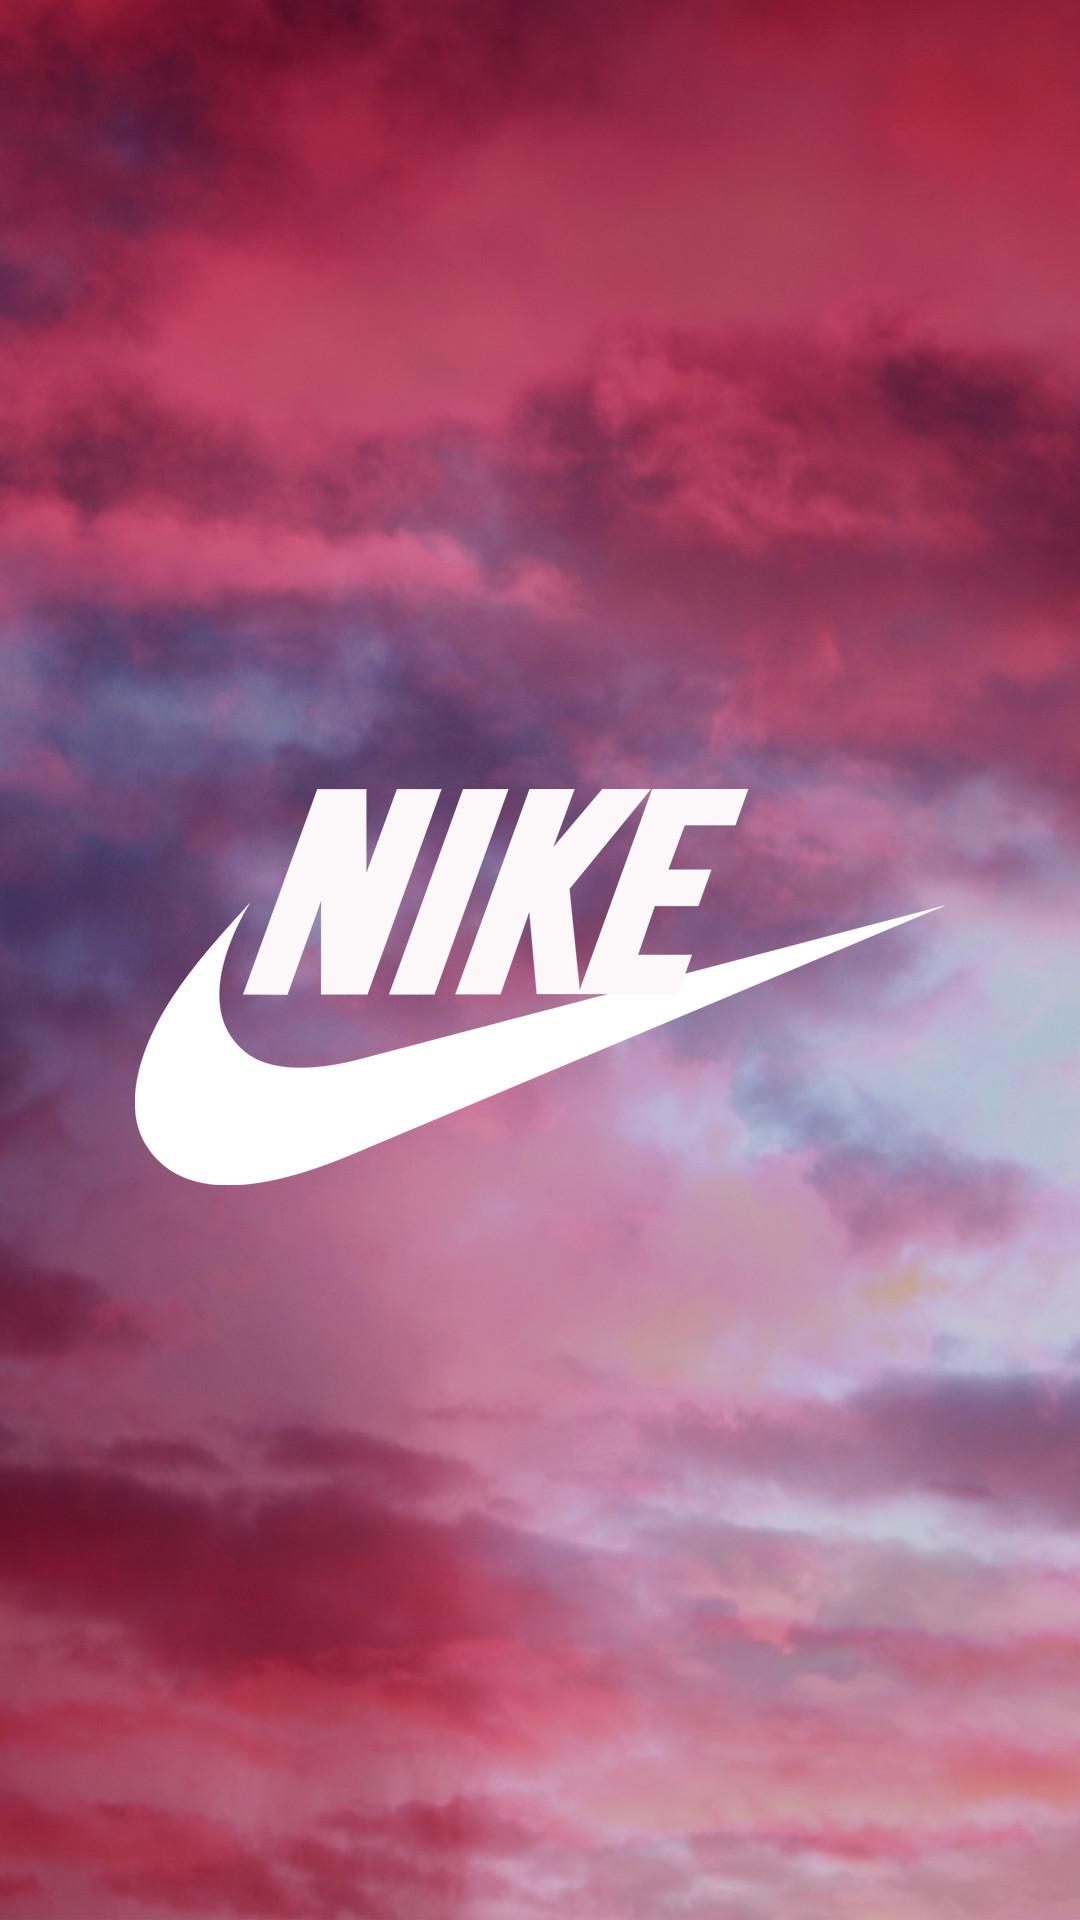 Dope Nike Wallpaper 79 Images